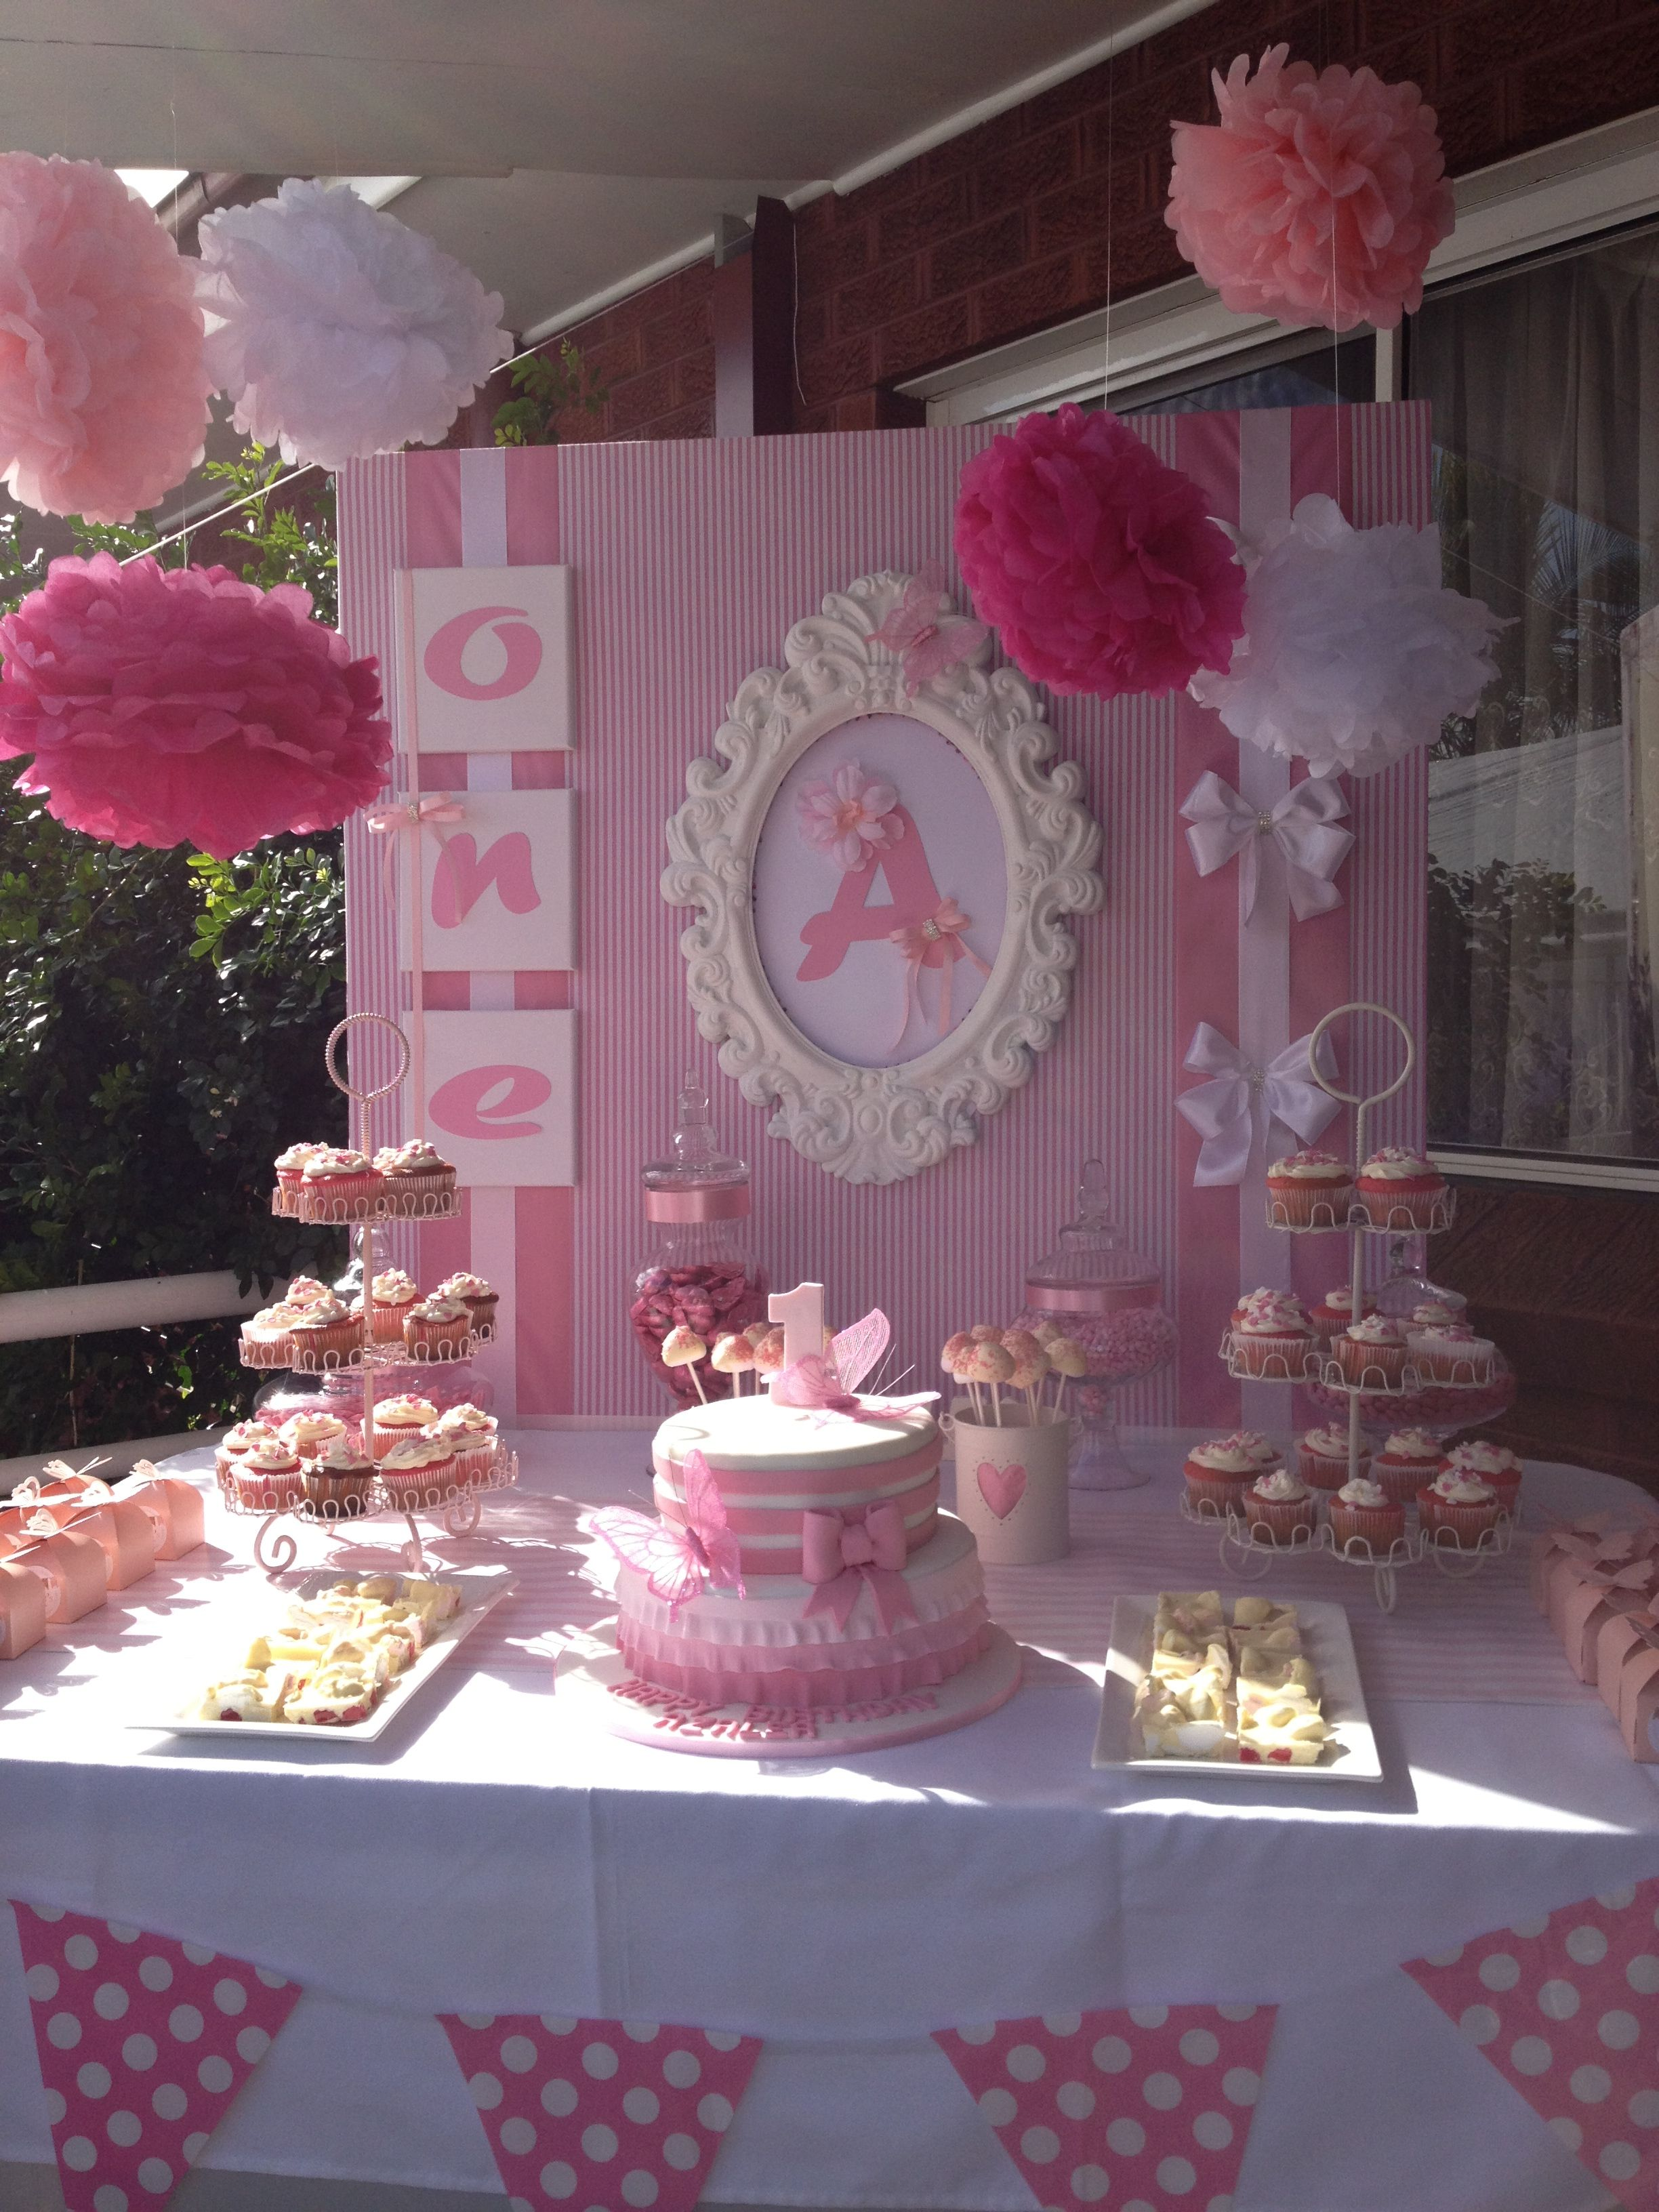 Pin By Natalie Lara On Candy Buffet Candy Bar Pink Candy Buffet Baby Shower Parties Baby Shower